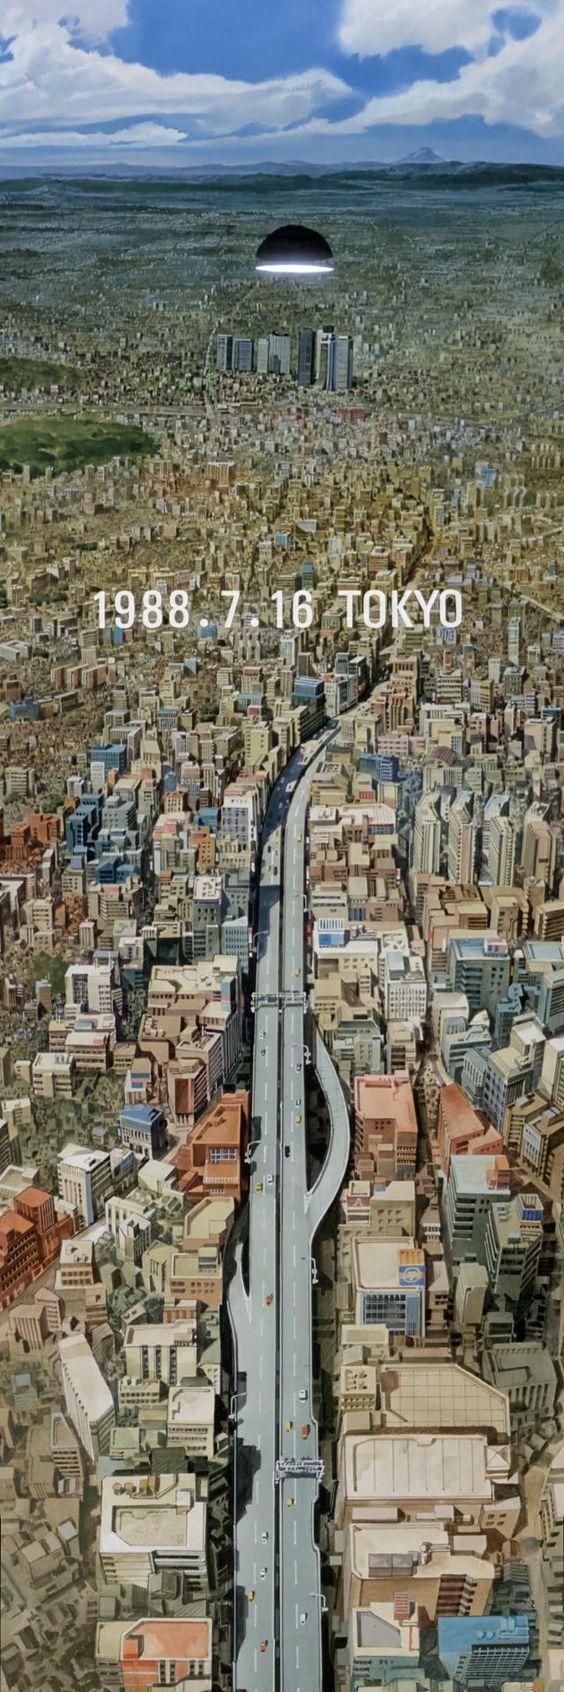 Akira — Tokyo 1988